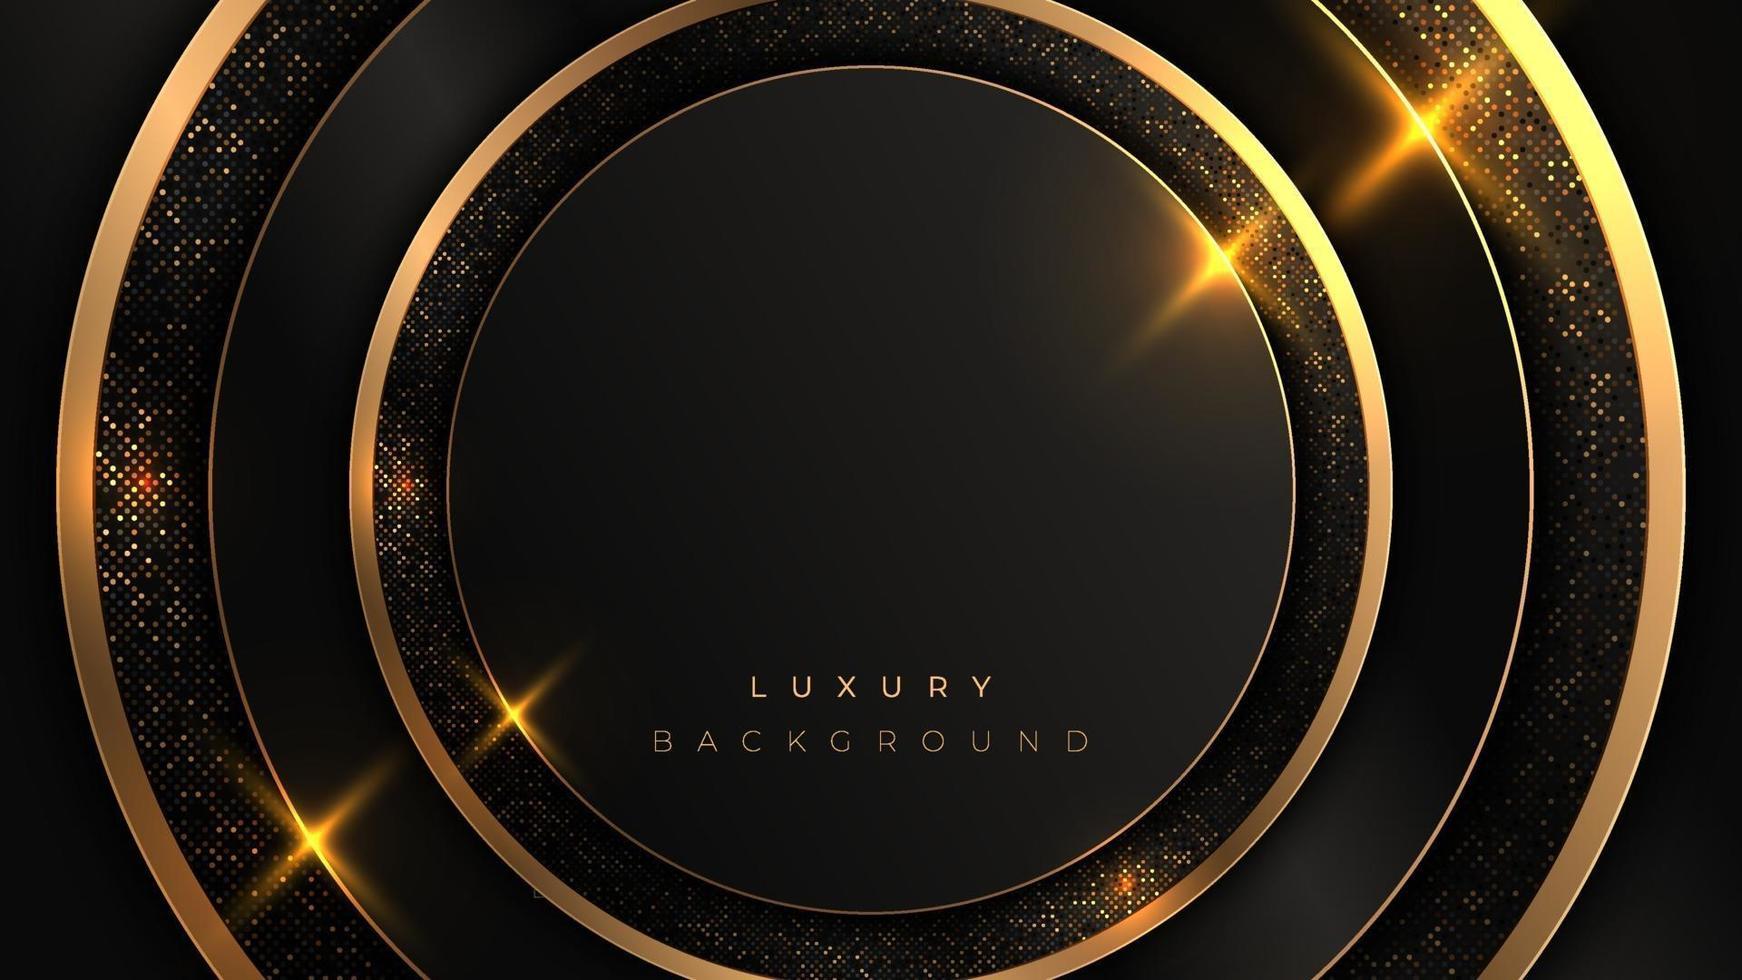 zwarte en gouden cirkel luxe achtergrond. rond glanzend gouden frame op ronde vorm. vector